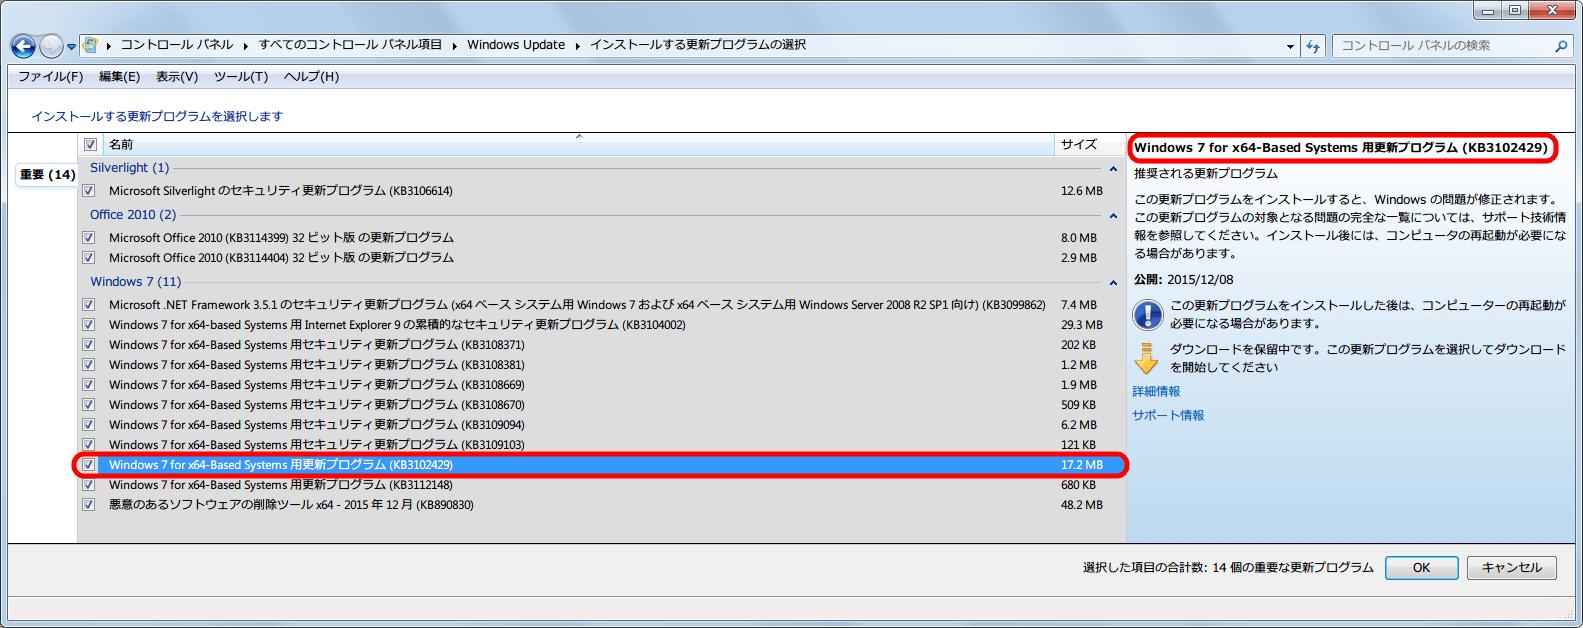 Windows Update 2015年12月分インストール、チェックマークがオフになっていた KB3102429 も一緒にインストール実施